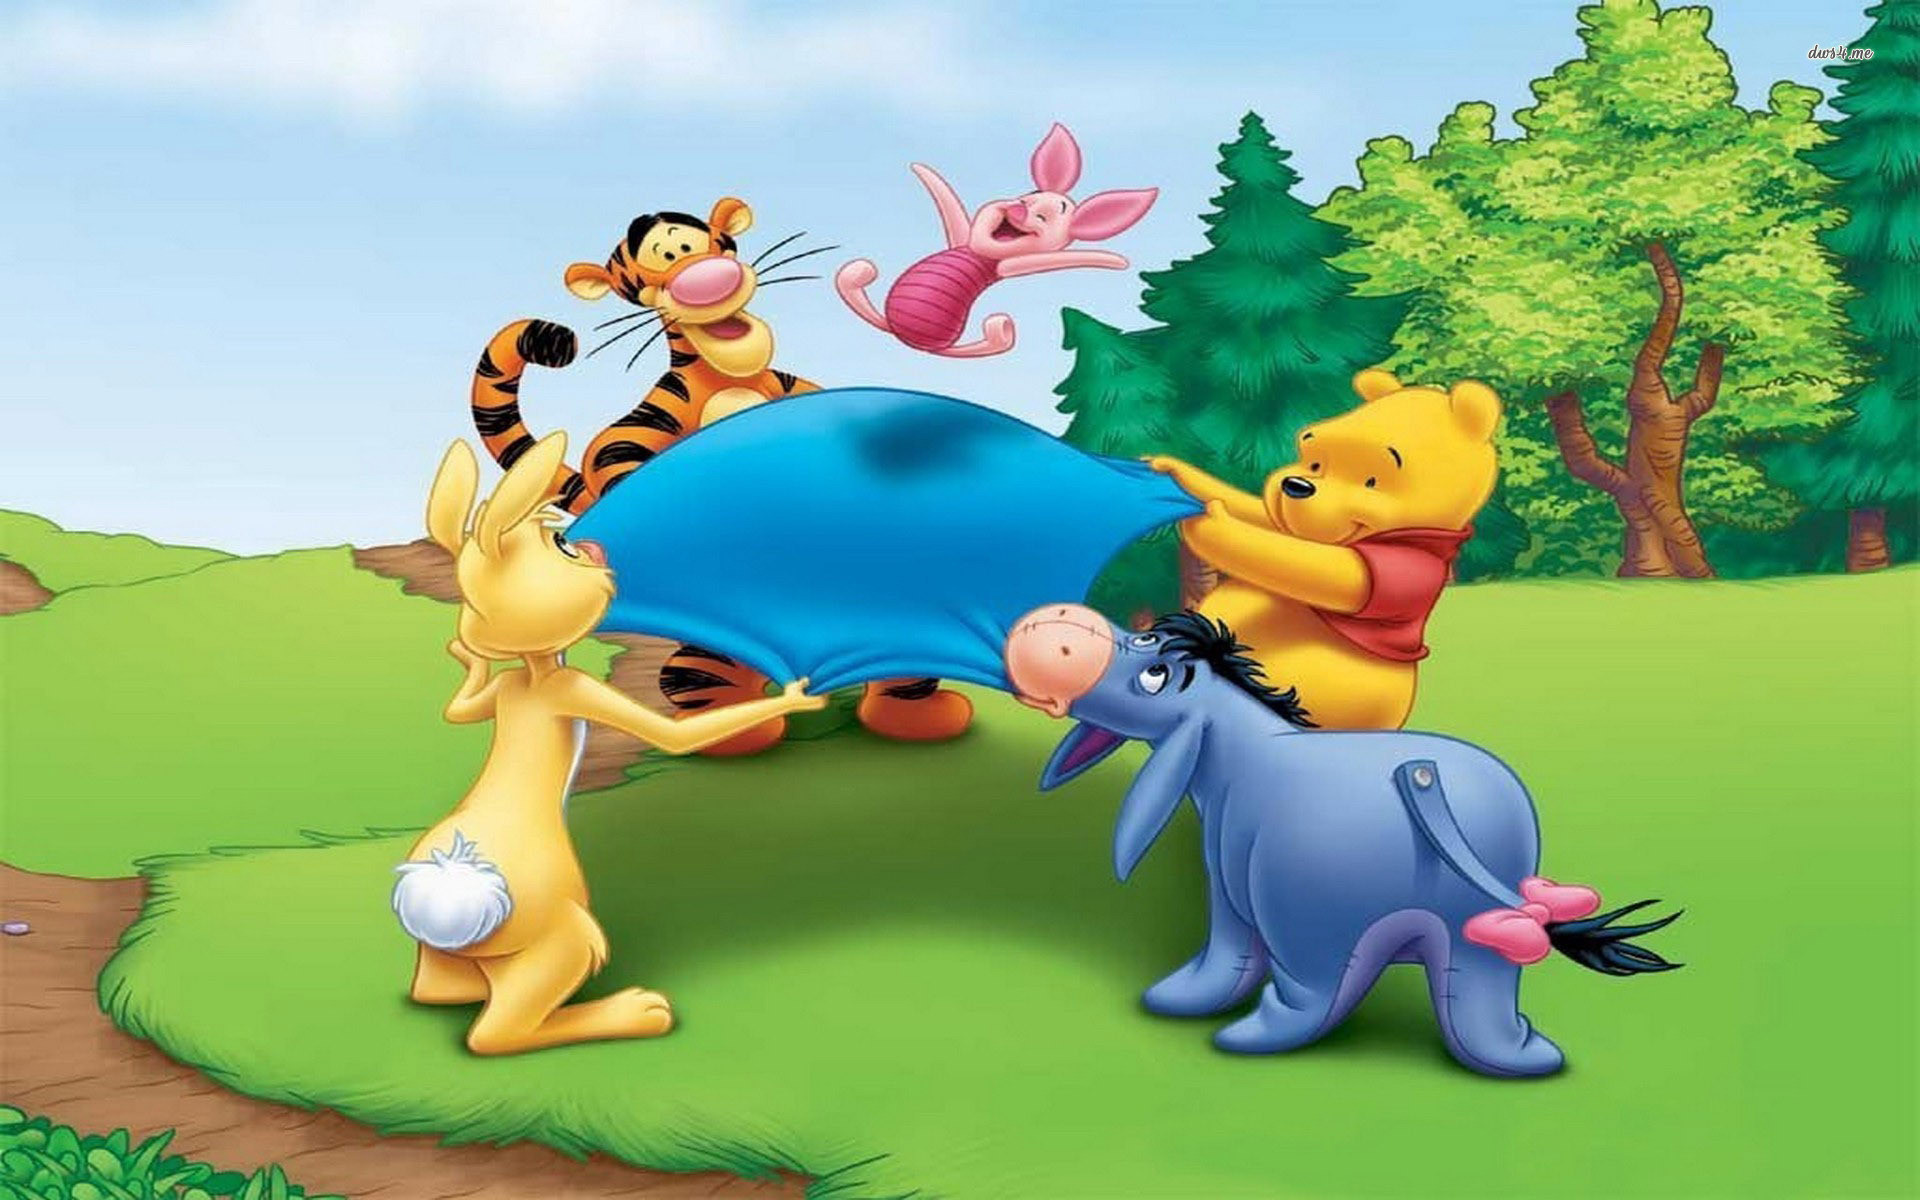 Winnie The Pooh Fall Desktop Wallpaper Winnie The Pooh Easter Wallpaper 64 Images